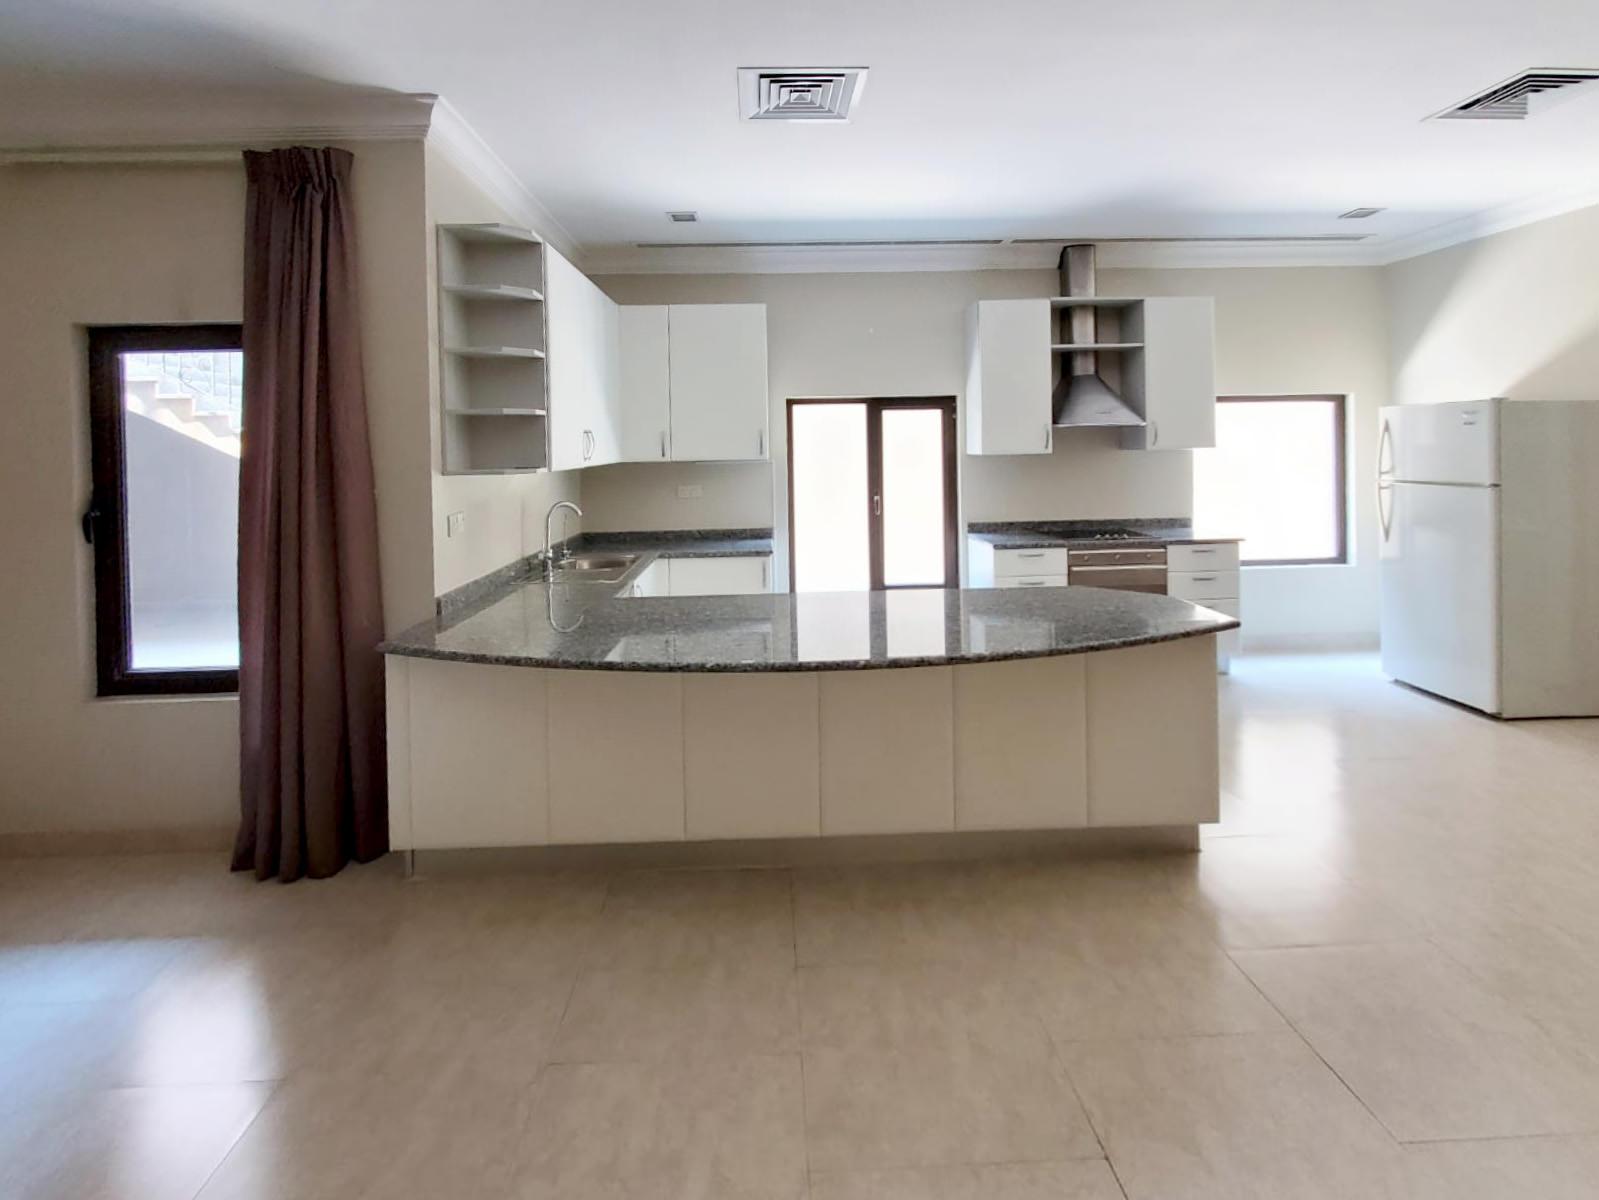 Rumaithiya -unfurnished, light basement apartment w/yard